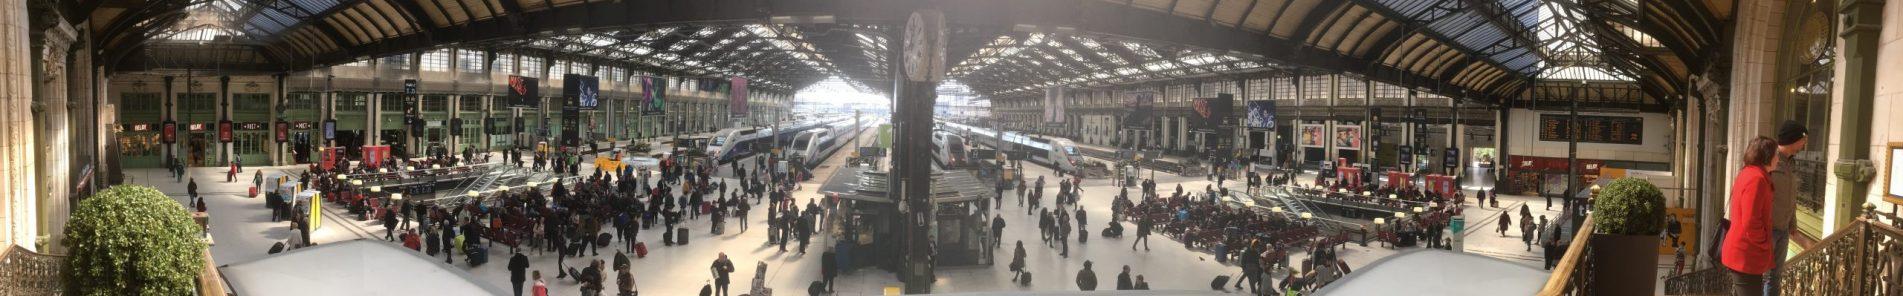 cropped-Gare-de-Lyon-scaled-1.jpg